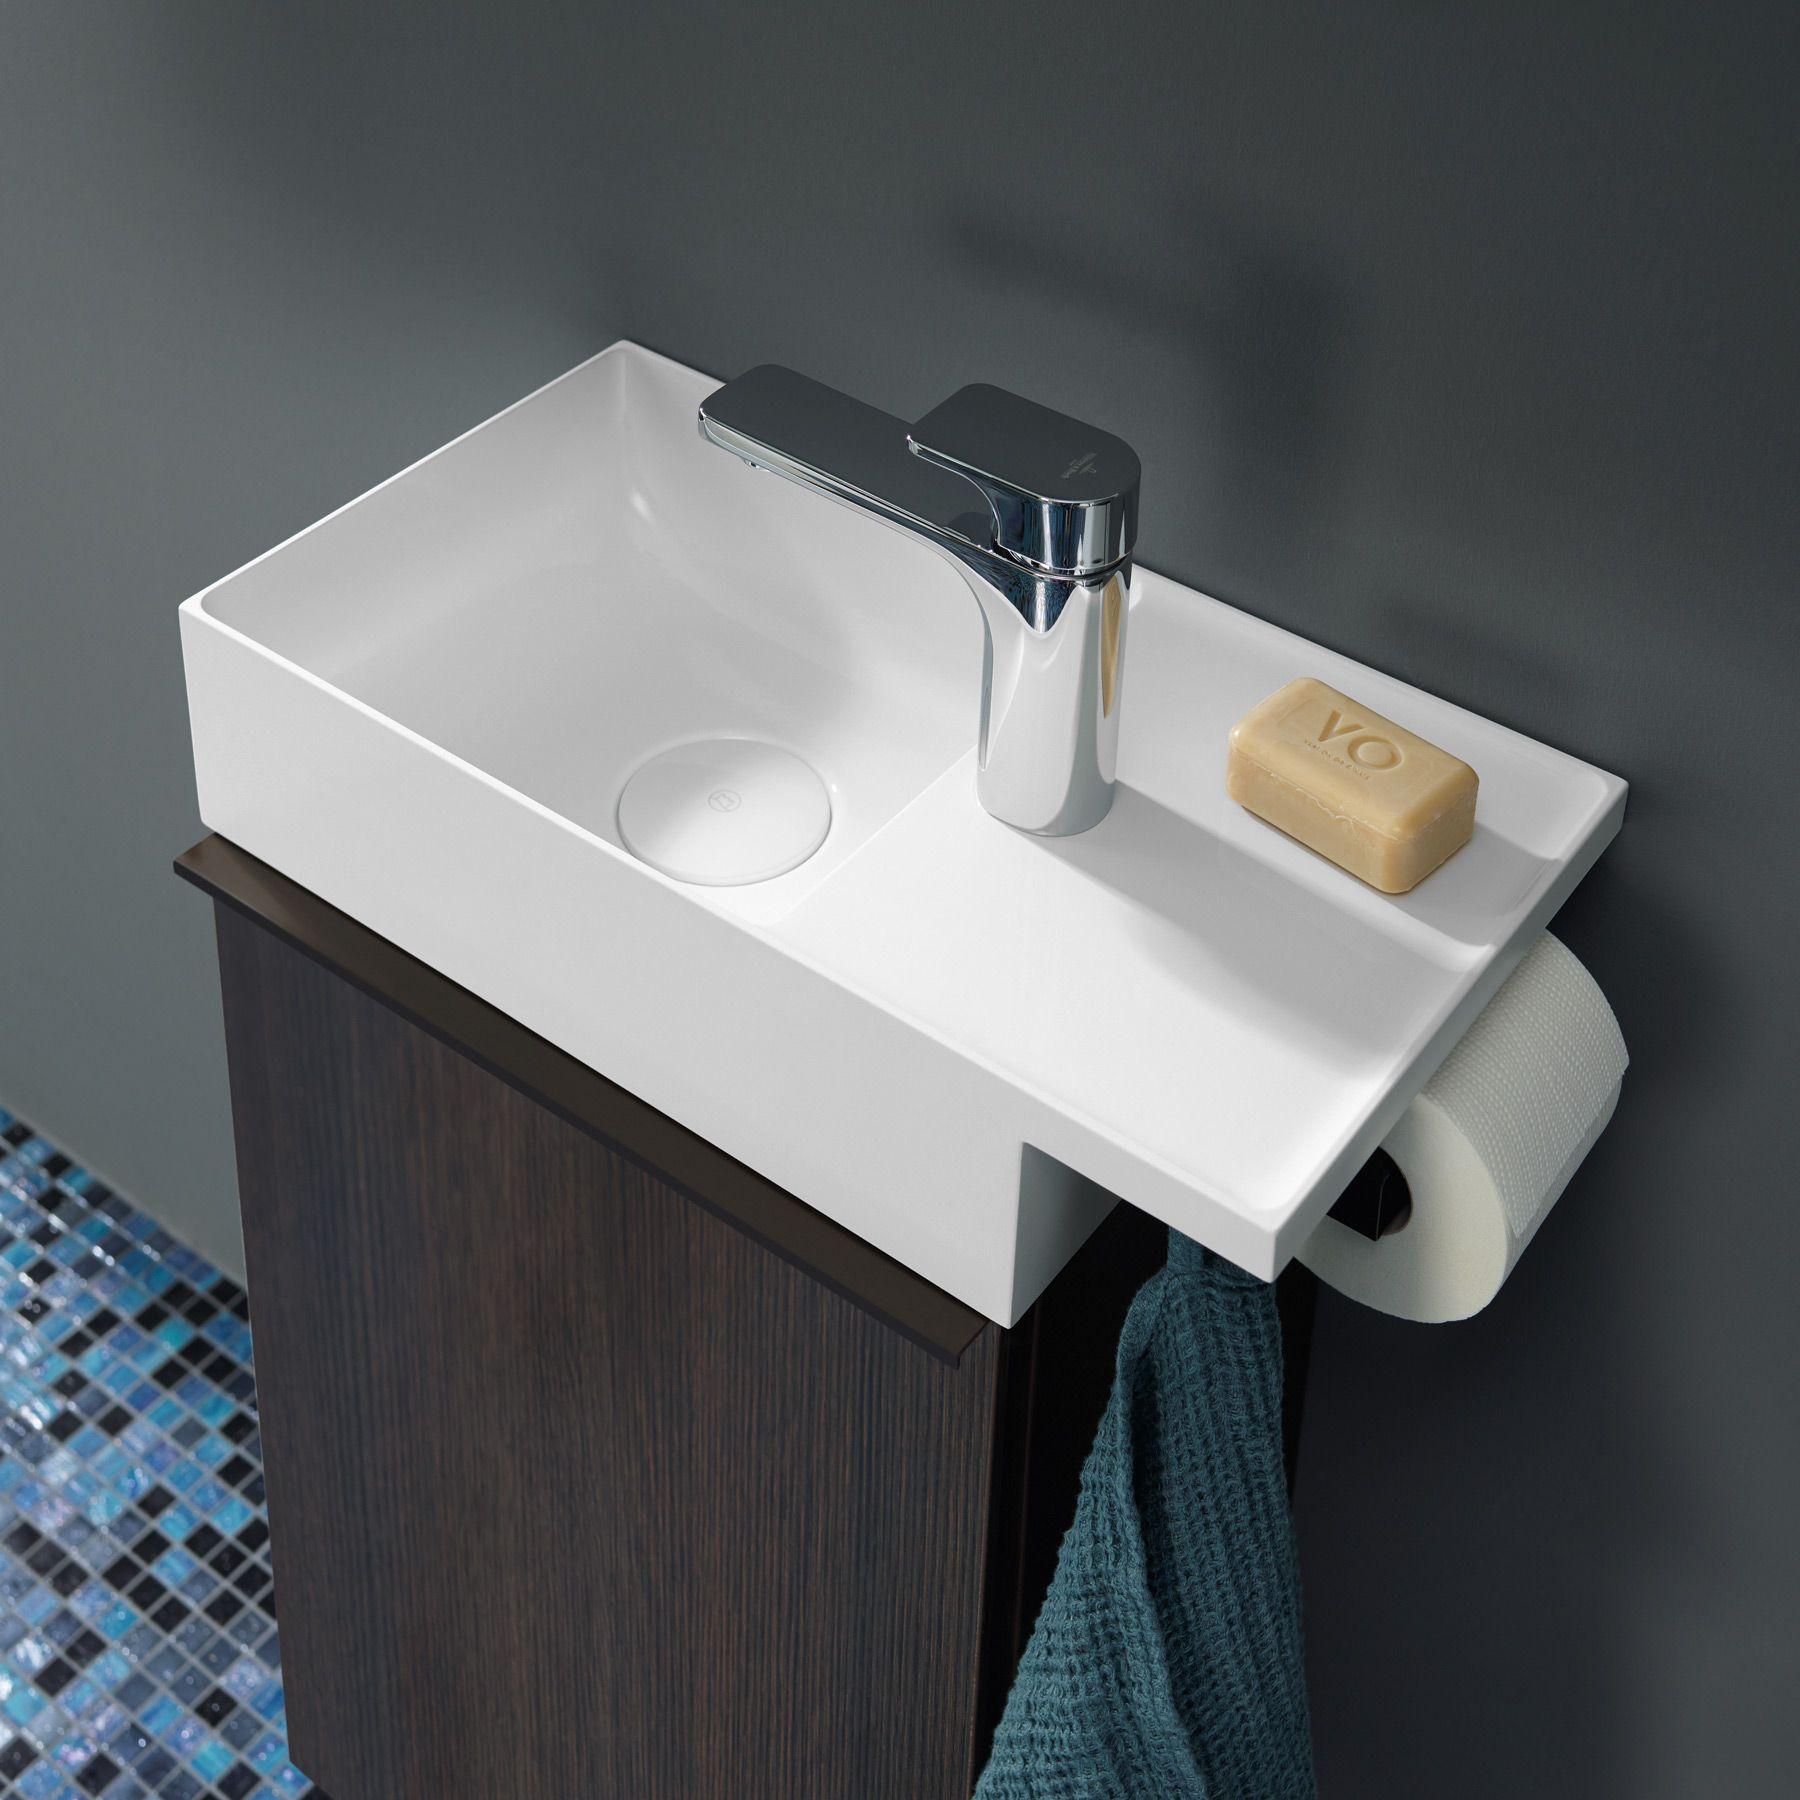 Perfect For Your Guest Bathroom Burgbad Yumo Washbasin With Integrated Wc Paper And Towel Holder Design B Wc Renovieren Kleines Bad Waschbecken Kleiderablage